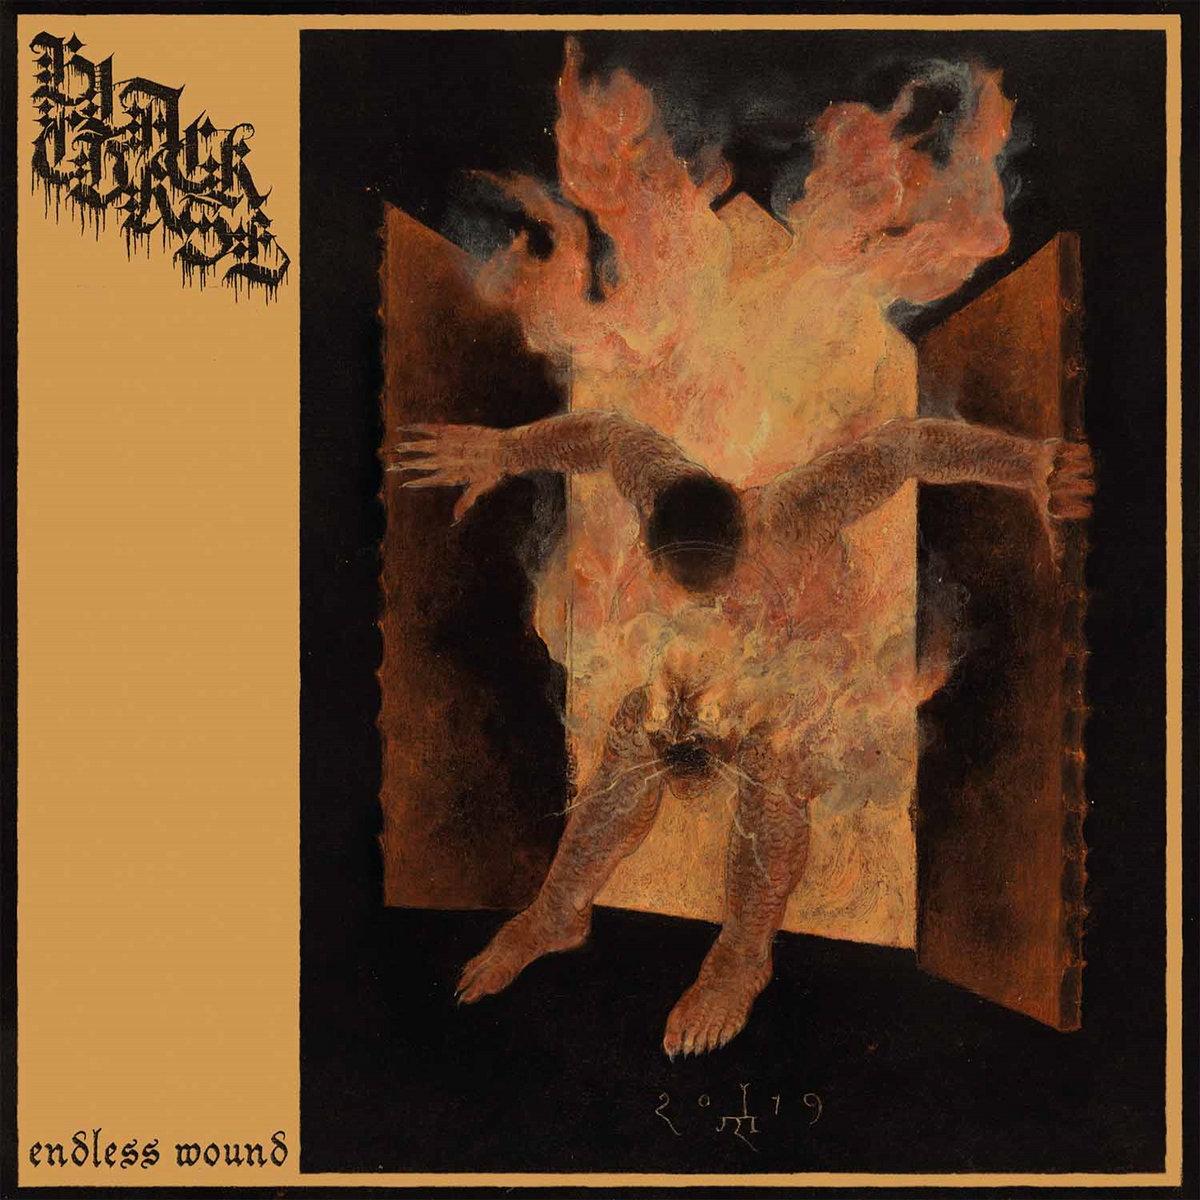 Black Curse - Endless Wound - 2020